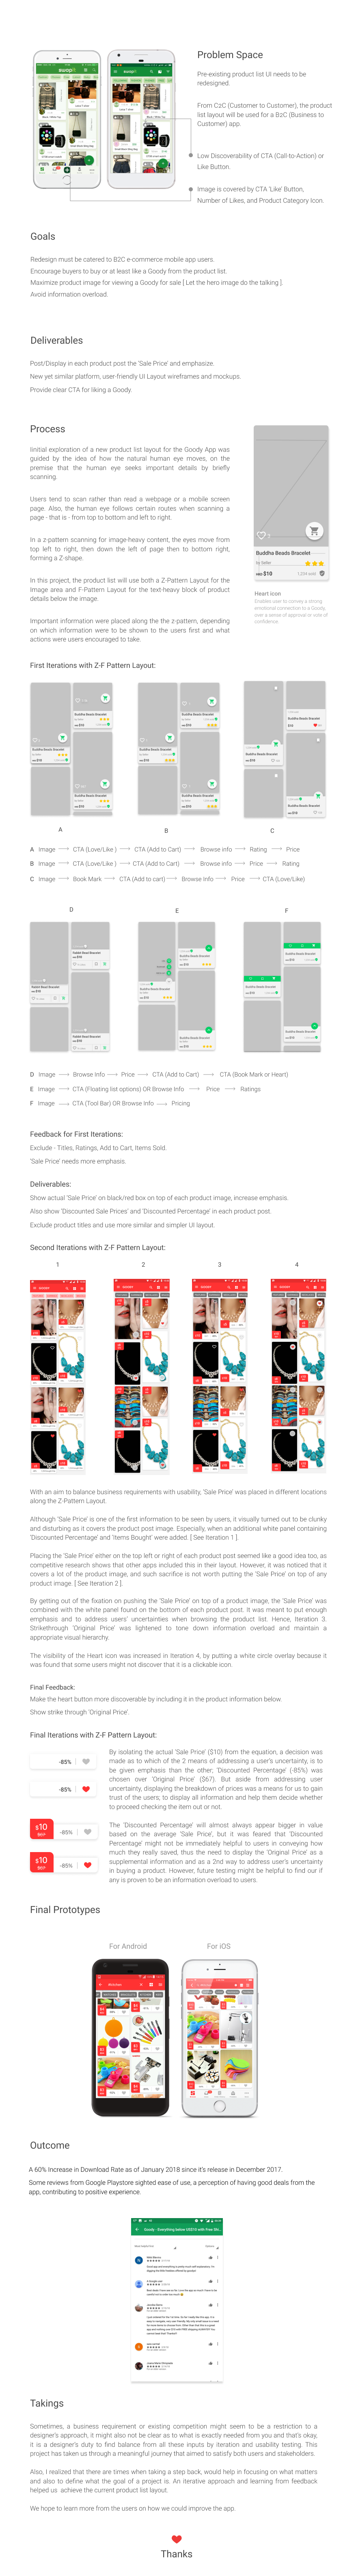 goody UX Case Study product list CTA Ecommerce e-commerce shopping app Mobile app